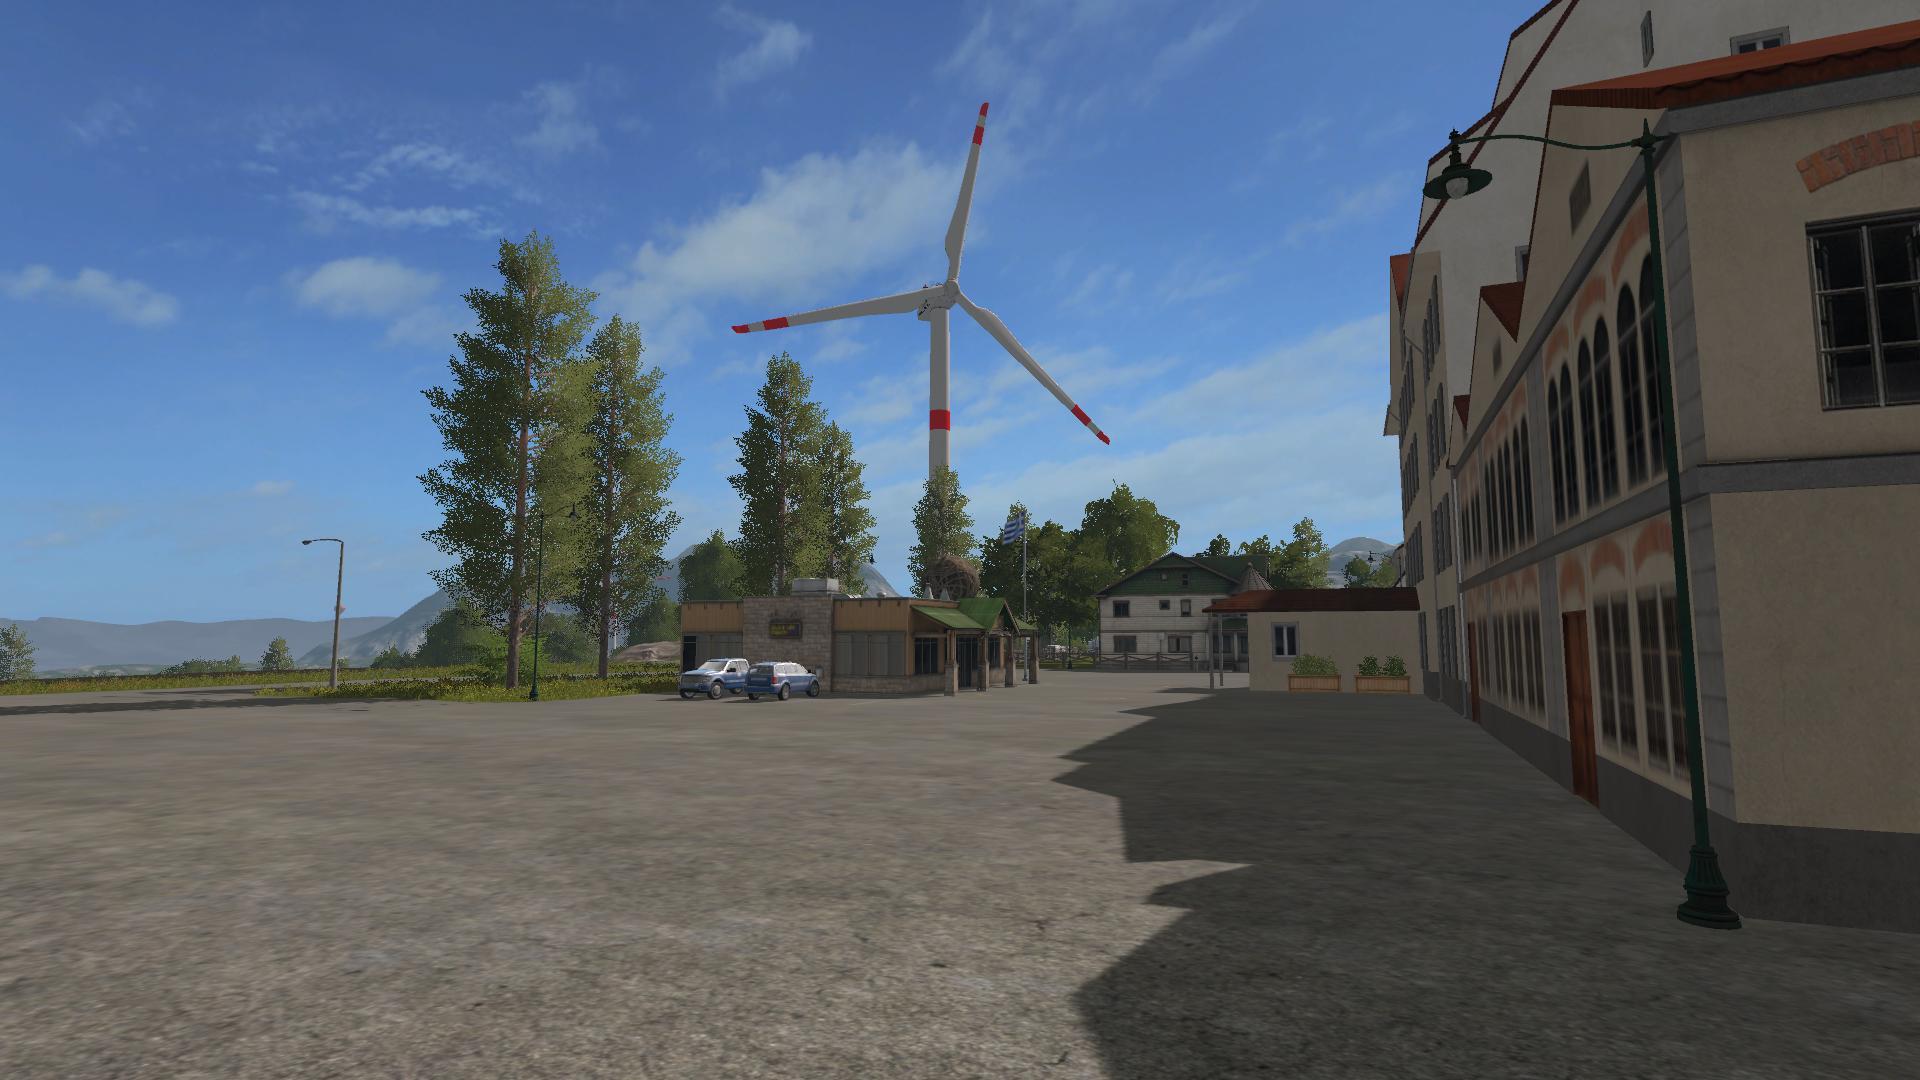 FS17-WESTBRIDGE-HILLS-SEASONS-V2 0 0-25 - Farming simulator